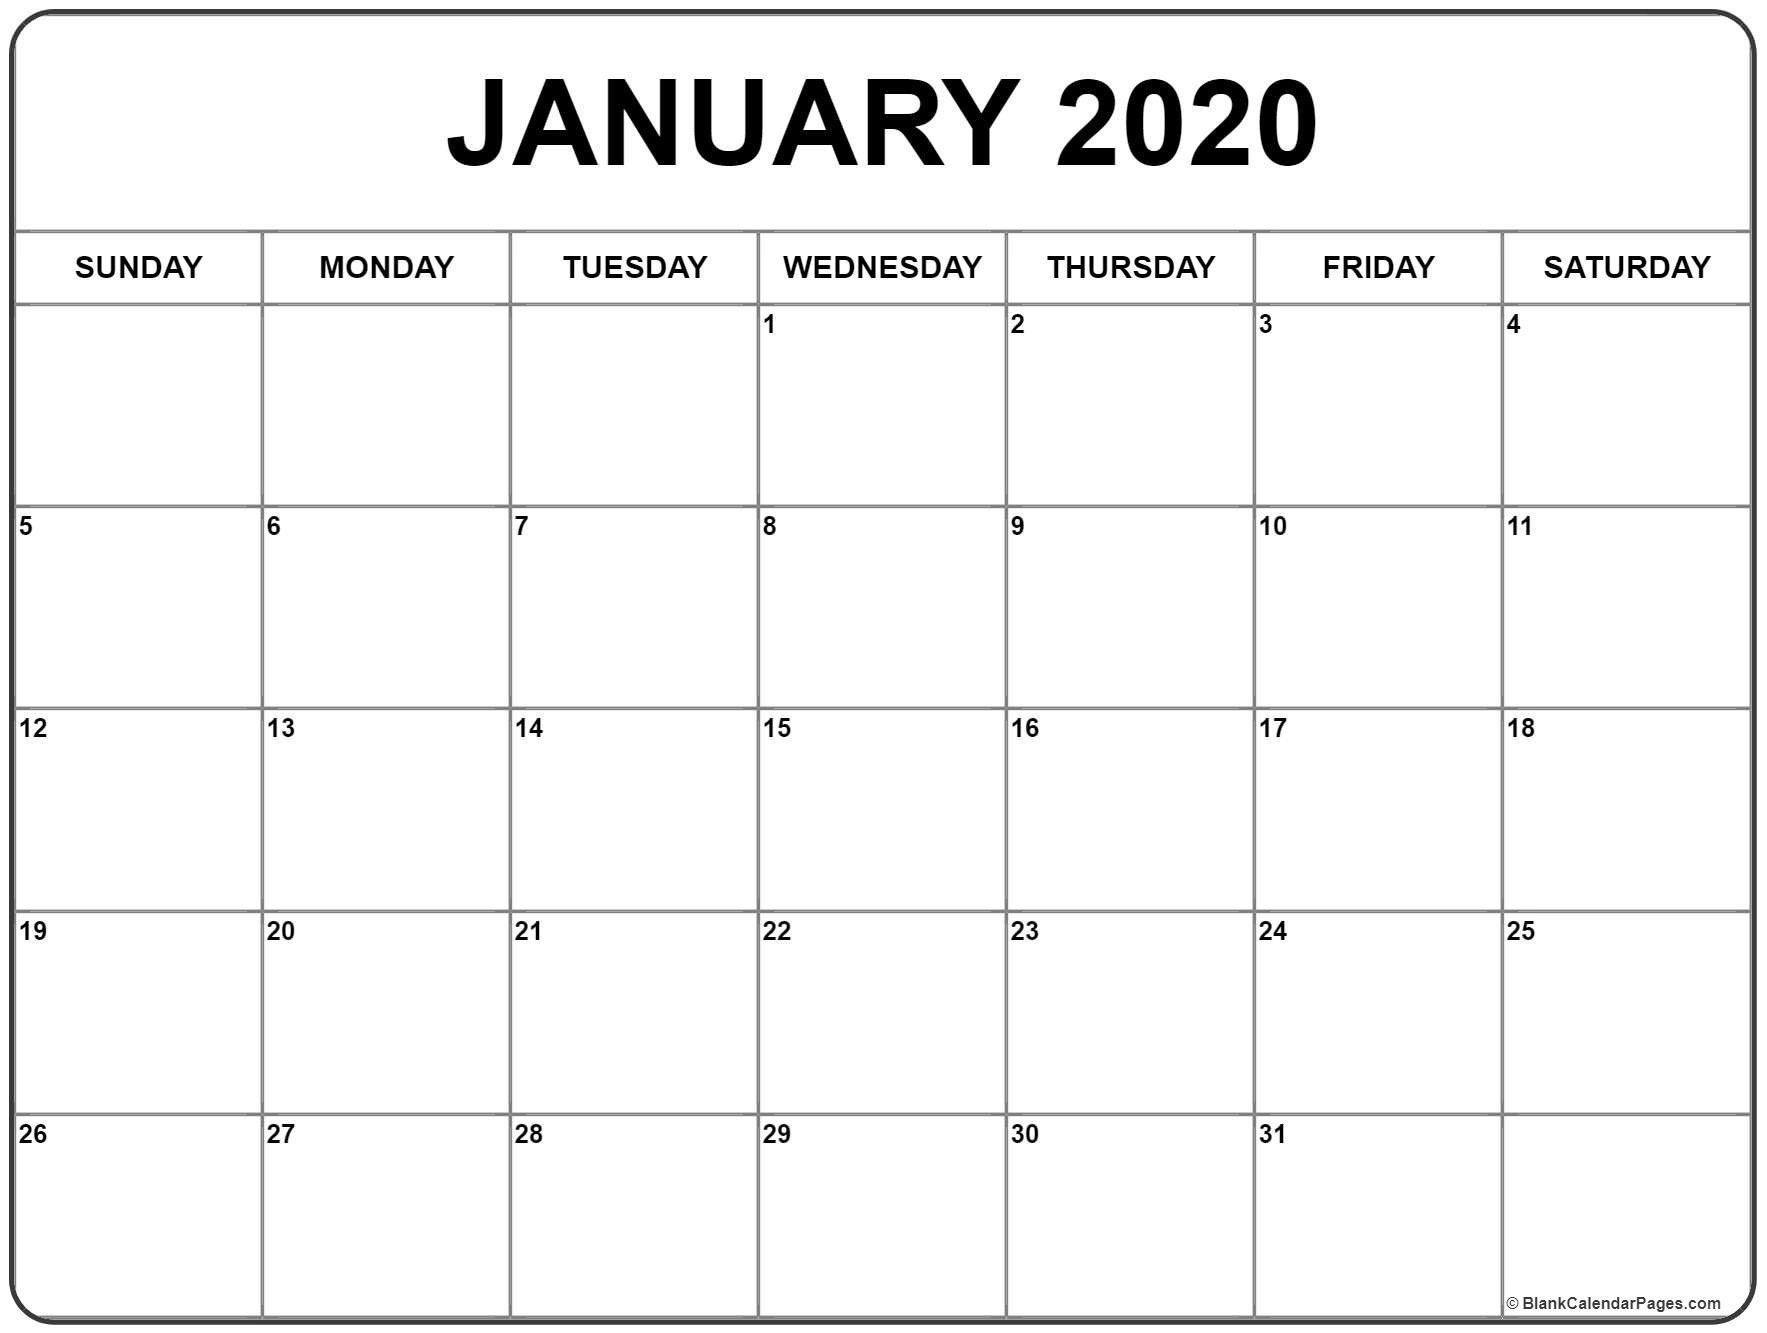 January 2020 Calendar 56 Templates Of 2020 Printable January  Blank Calendar Page Template Preschool